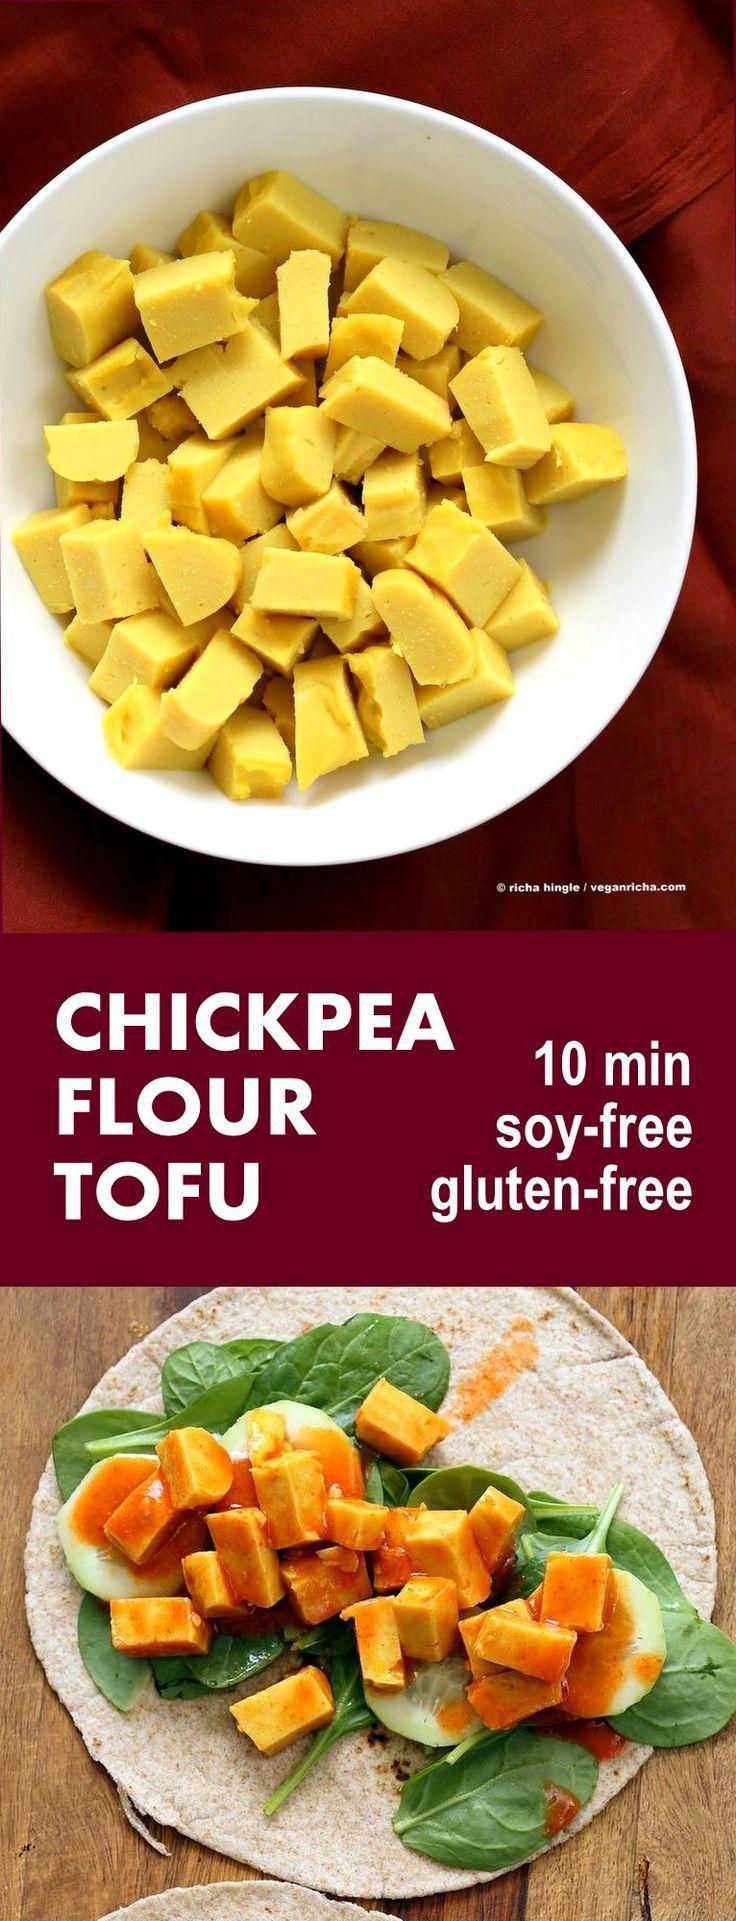 Chickpea flour Tofu. 10 min Non soy tofu made with Chickpea flour or Besan / gram flour. Easy Burmese tofu. #Vegan #Glutenfree #Soyfree #Nutfree #10minute #Recipe | VeganRicha.com